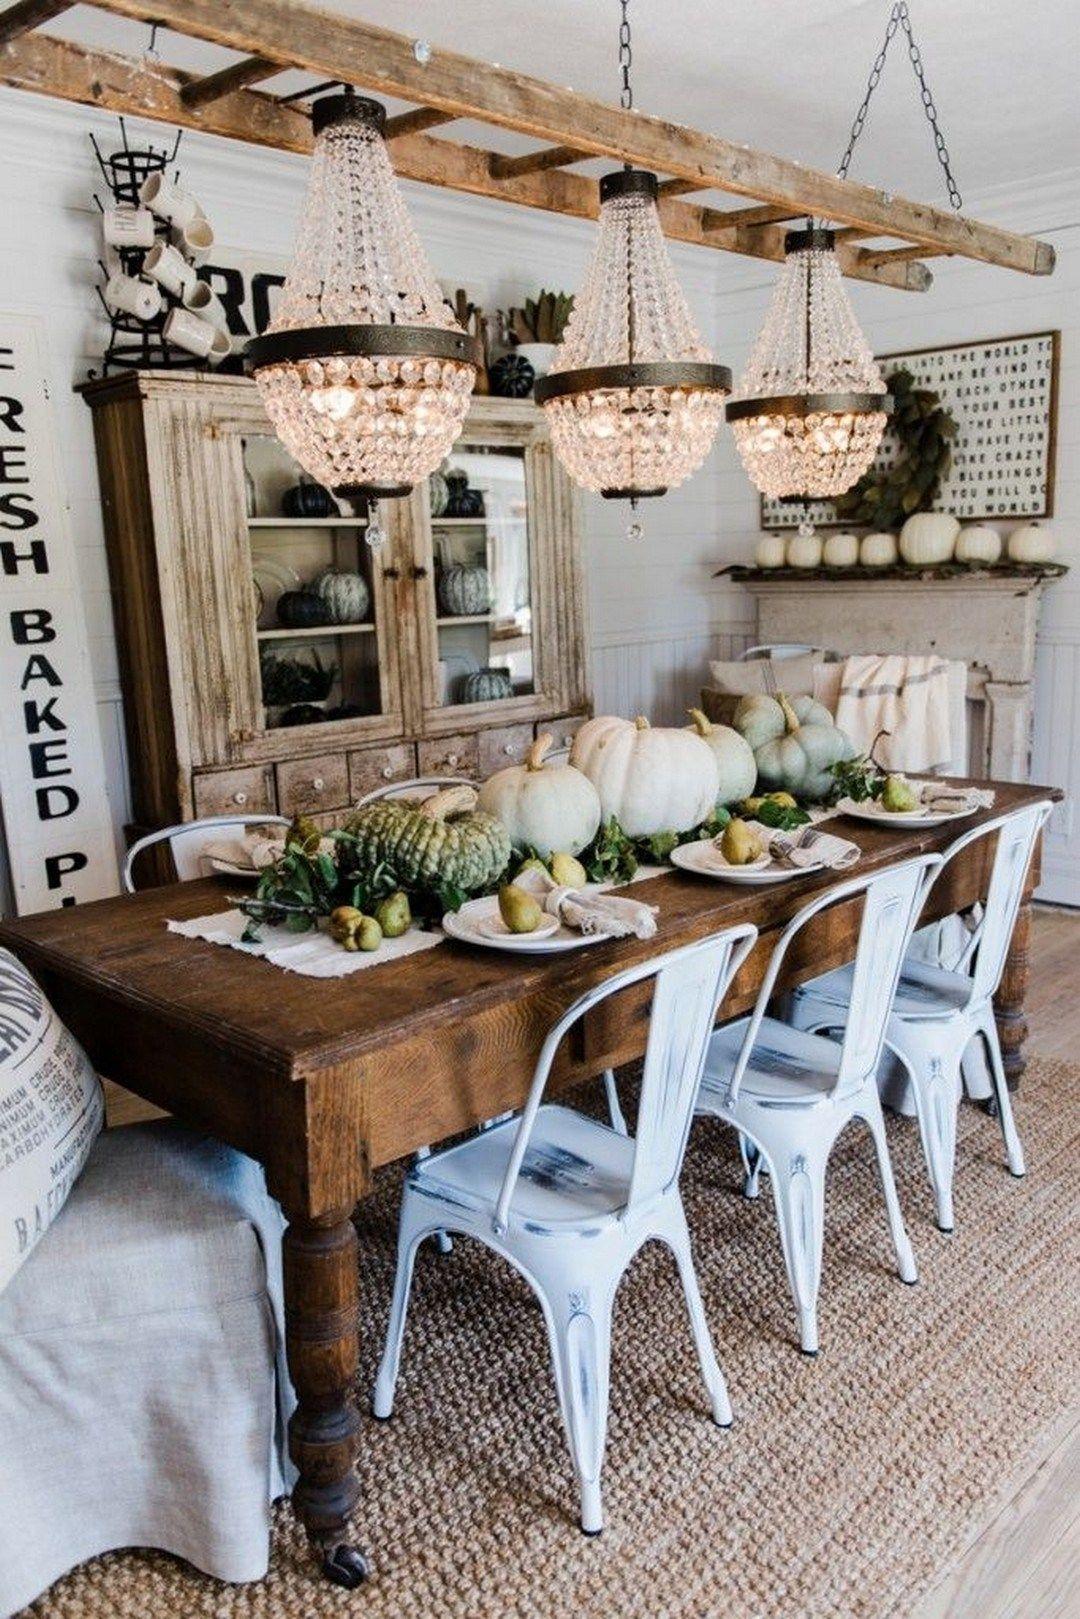 Rustic Farmhouse Bohemian Decorating Ideas Farmhouse Dining